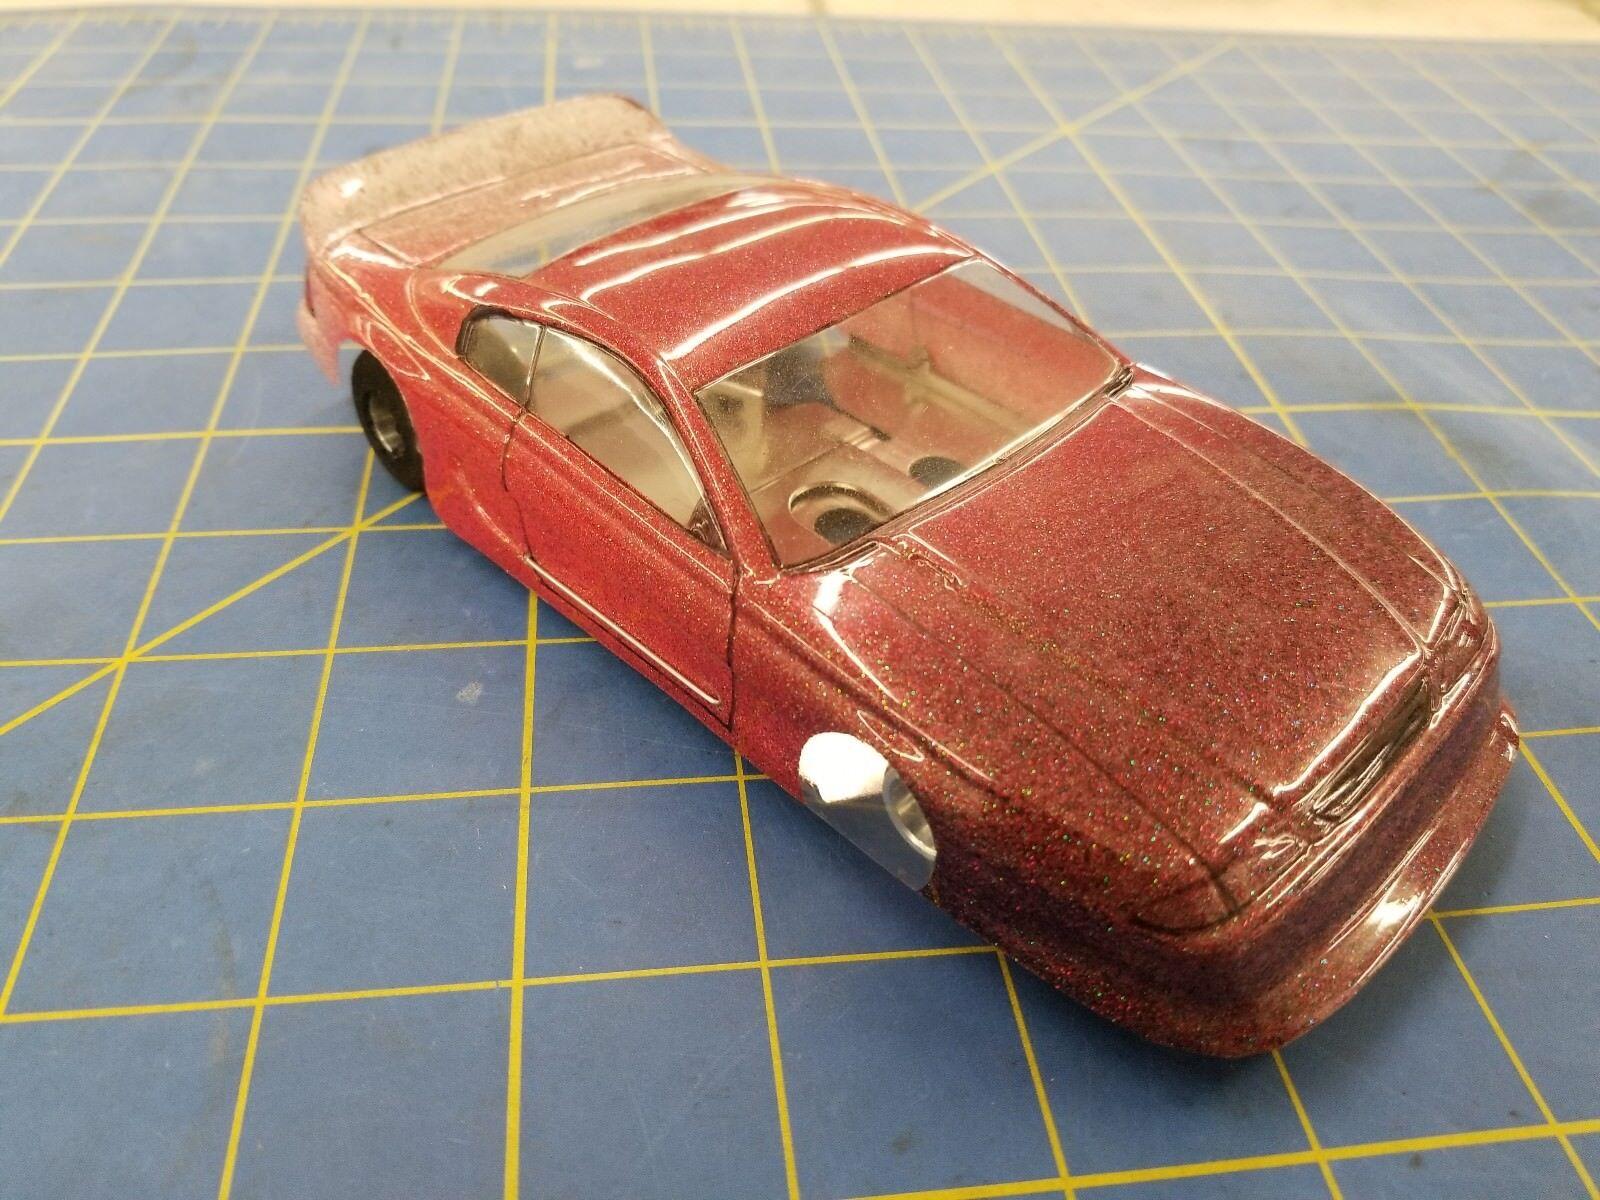 Nascar - rot glitzernden jk chettah w   et - 1   24 slot car mid america